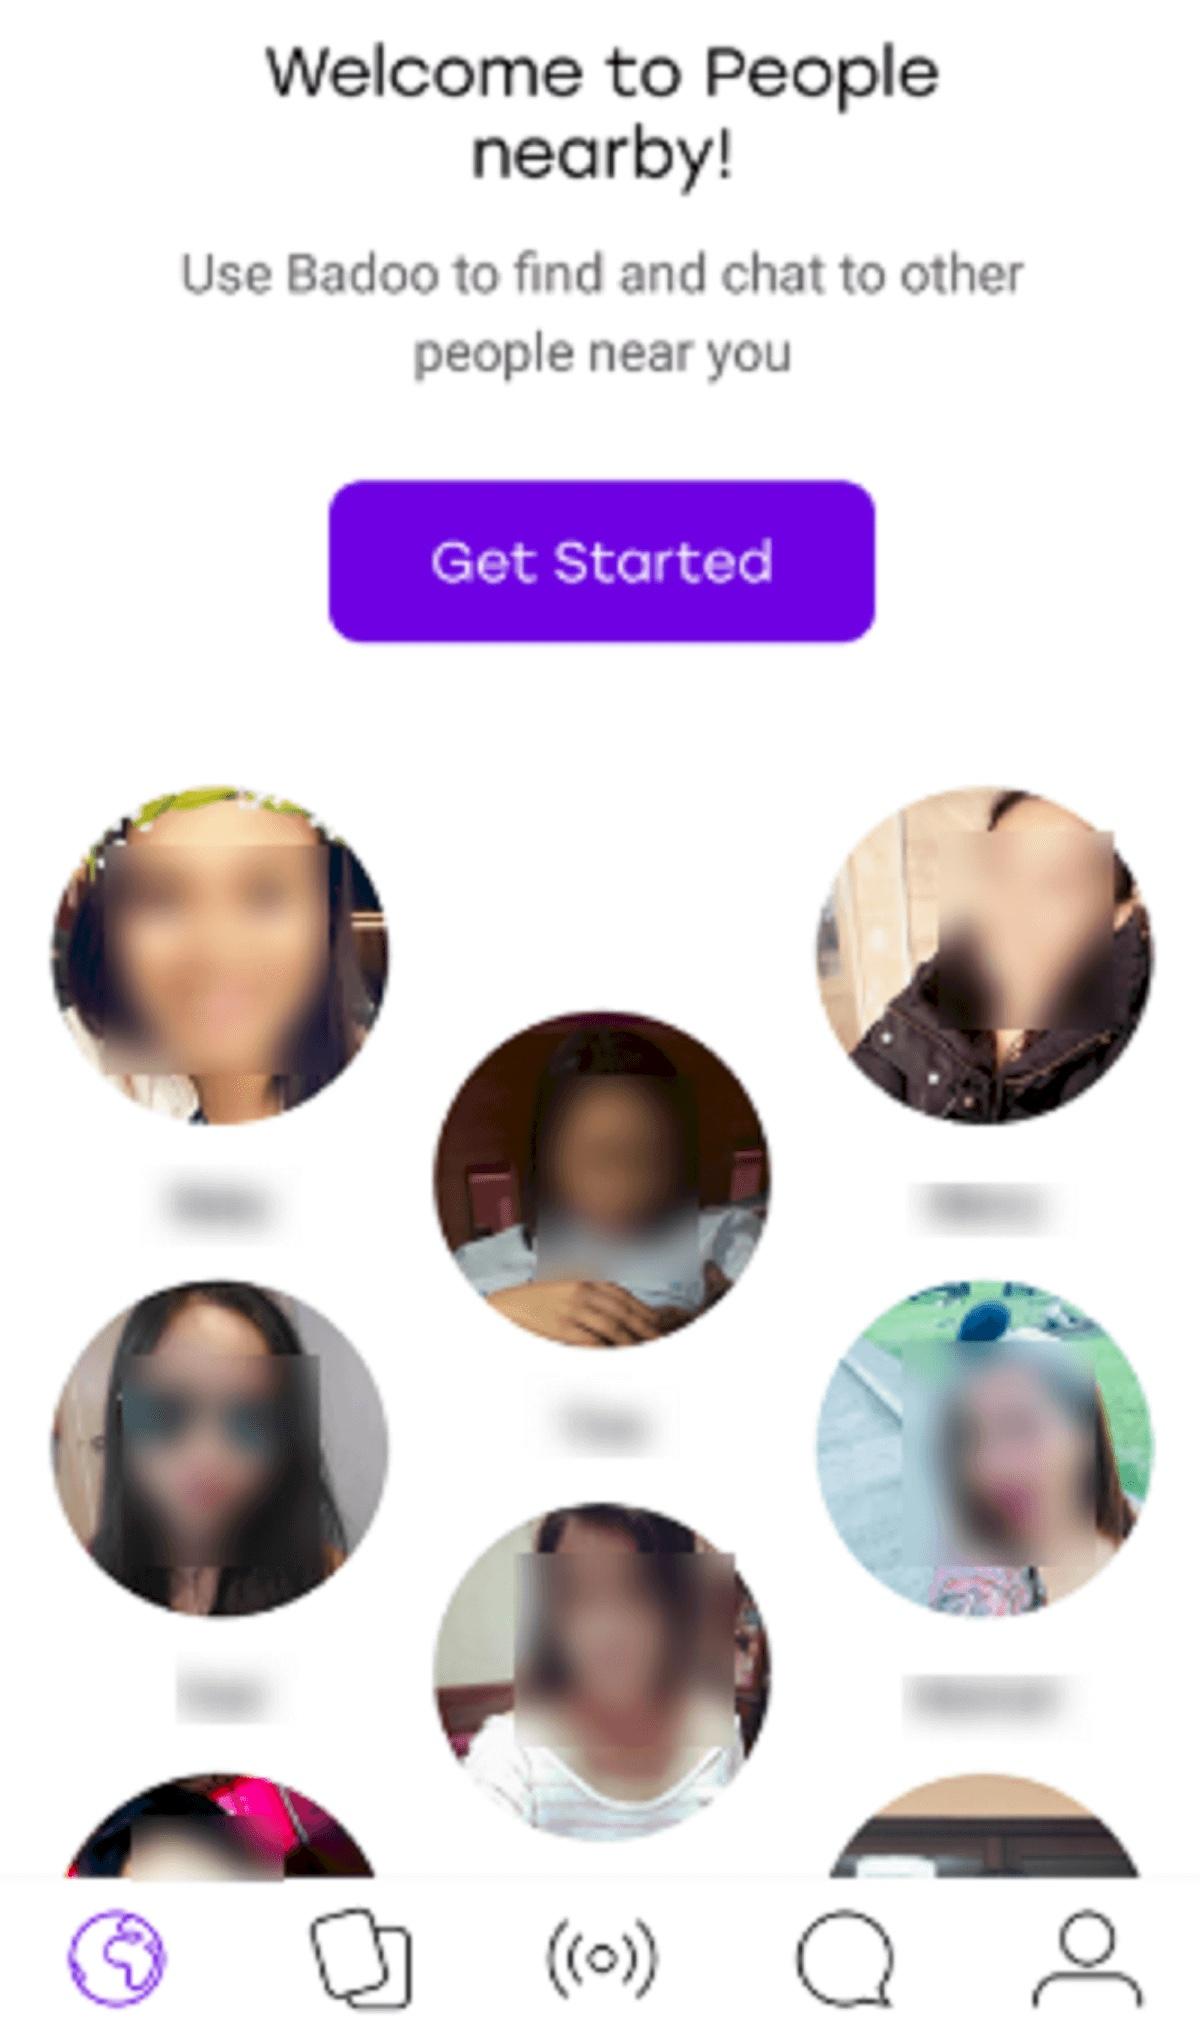 Badoo Review September 2019 - DatingScout com